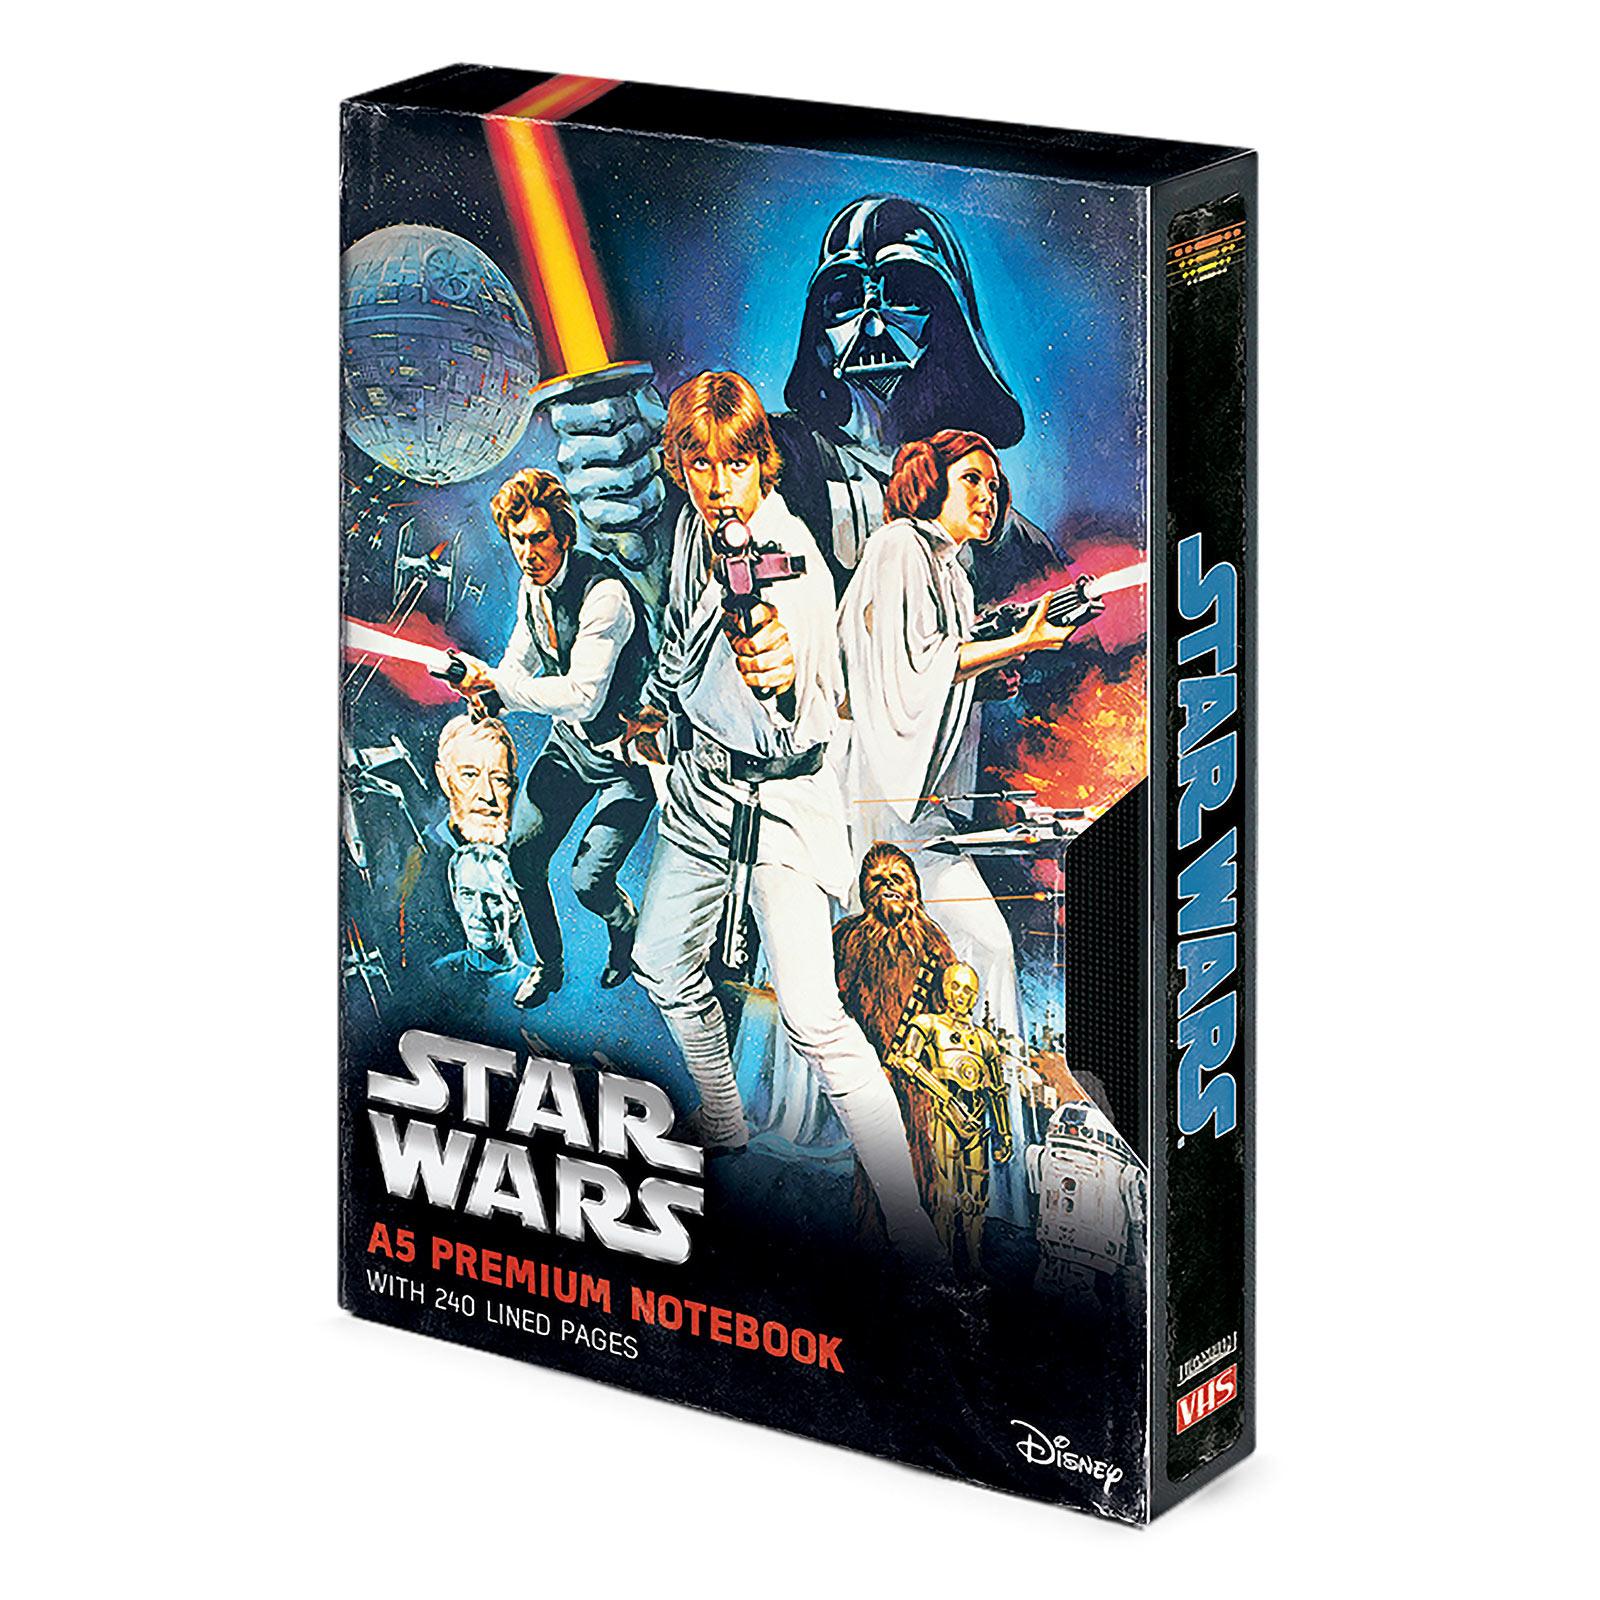 Star Wars - A New Hope Premium Notizbuch A5